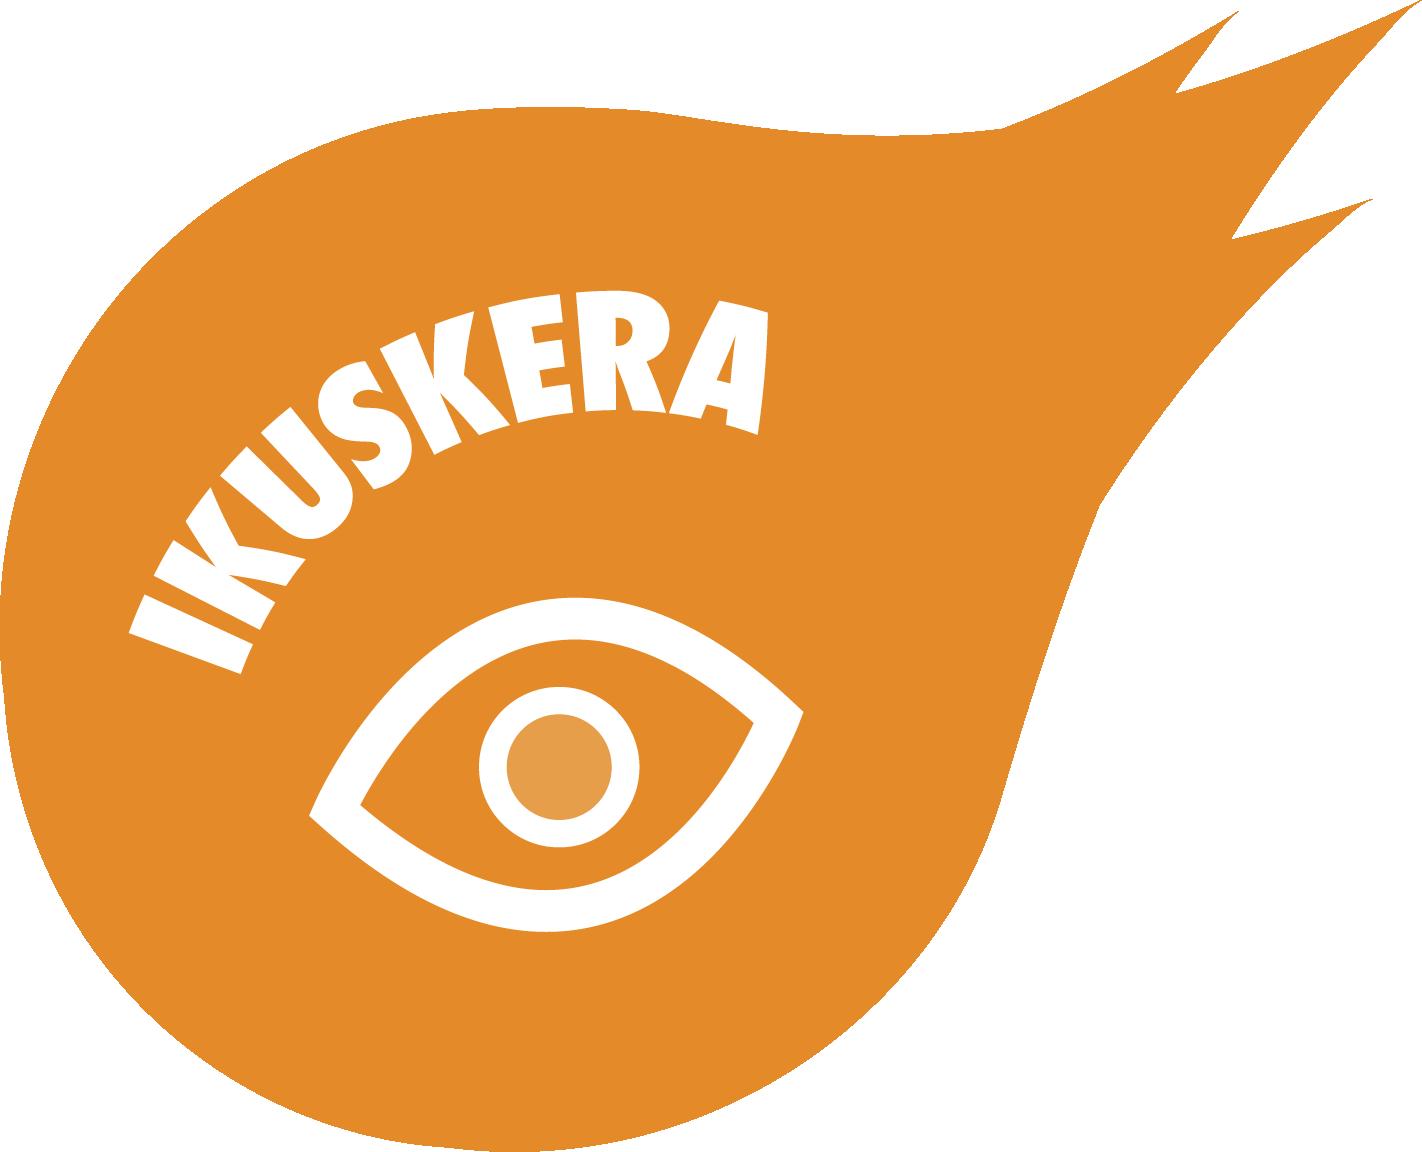 vision_EUSKERA